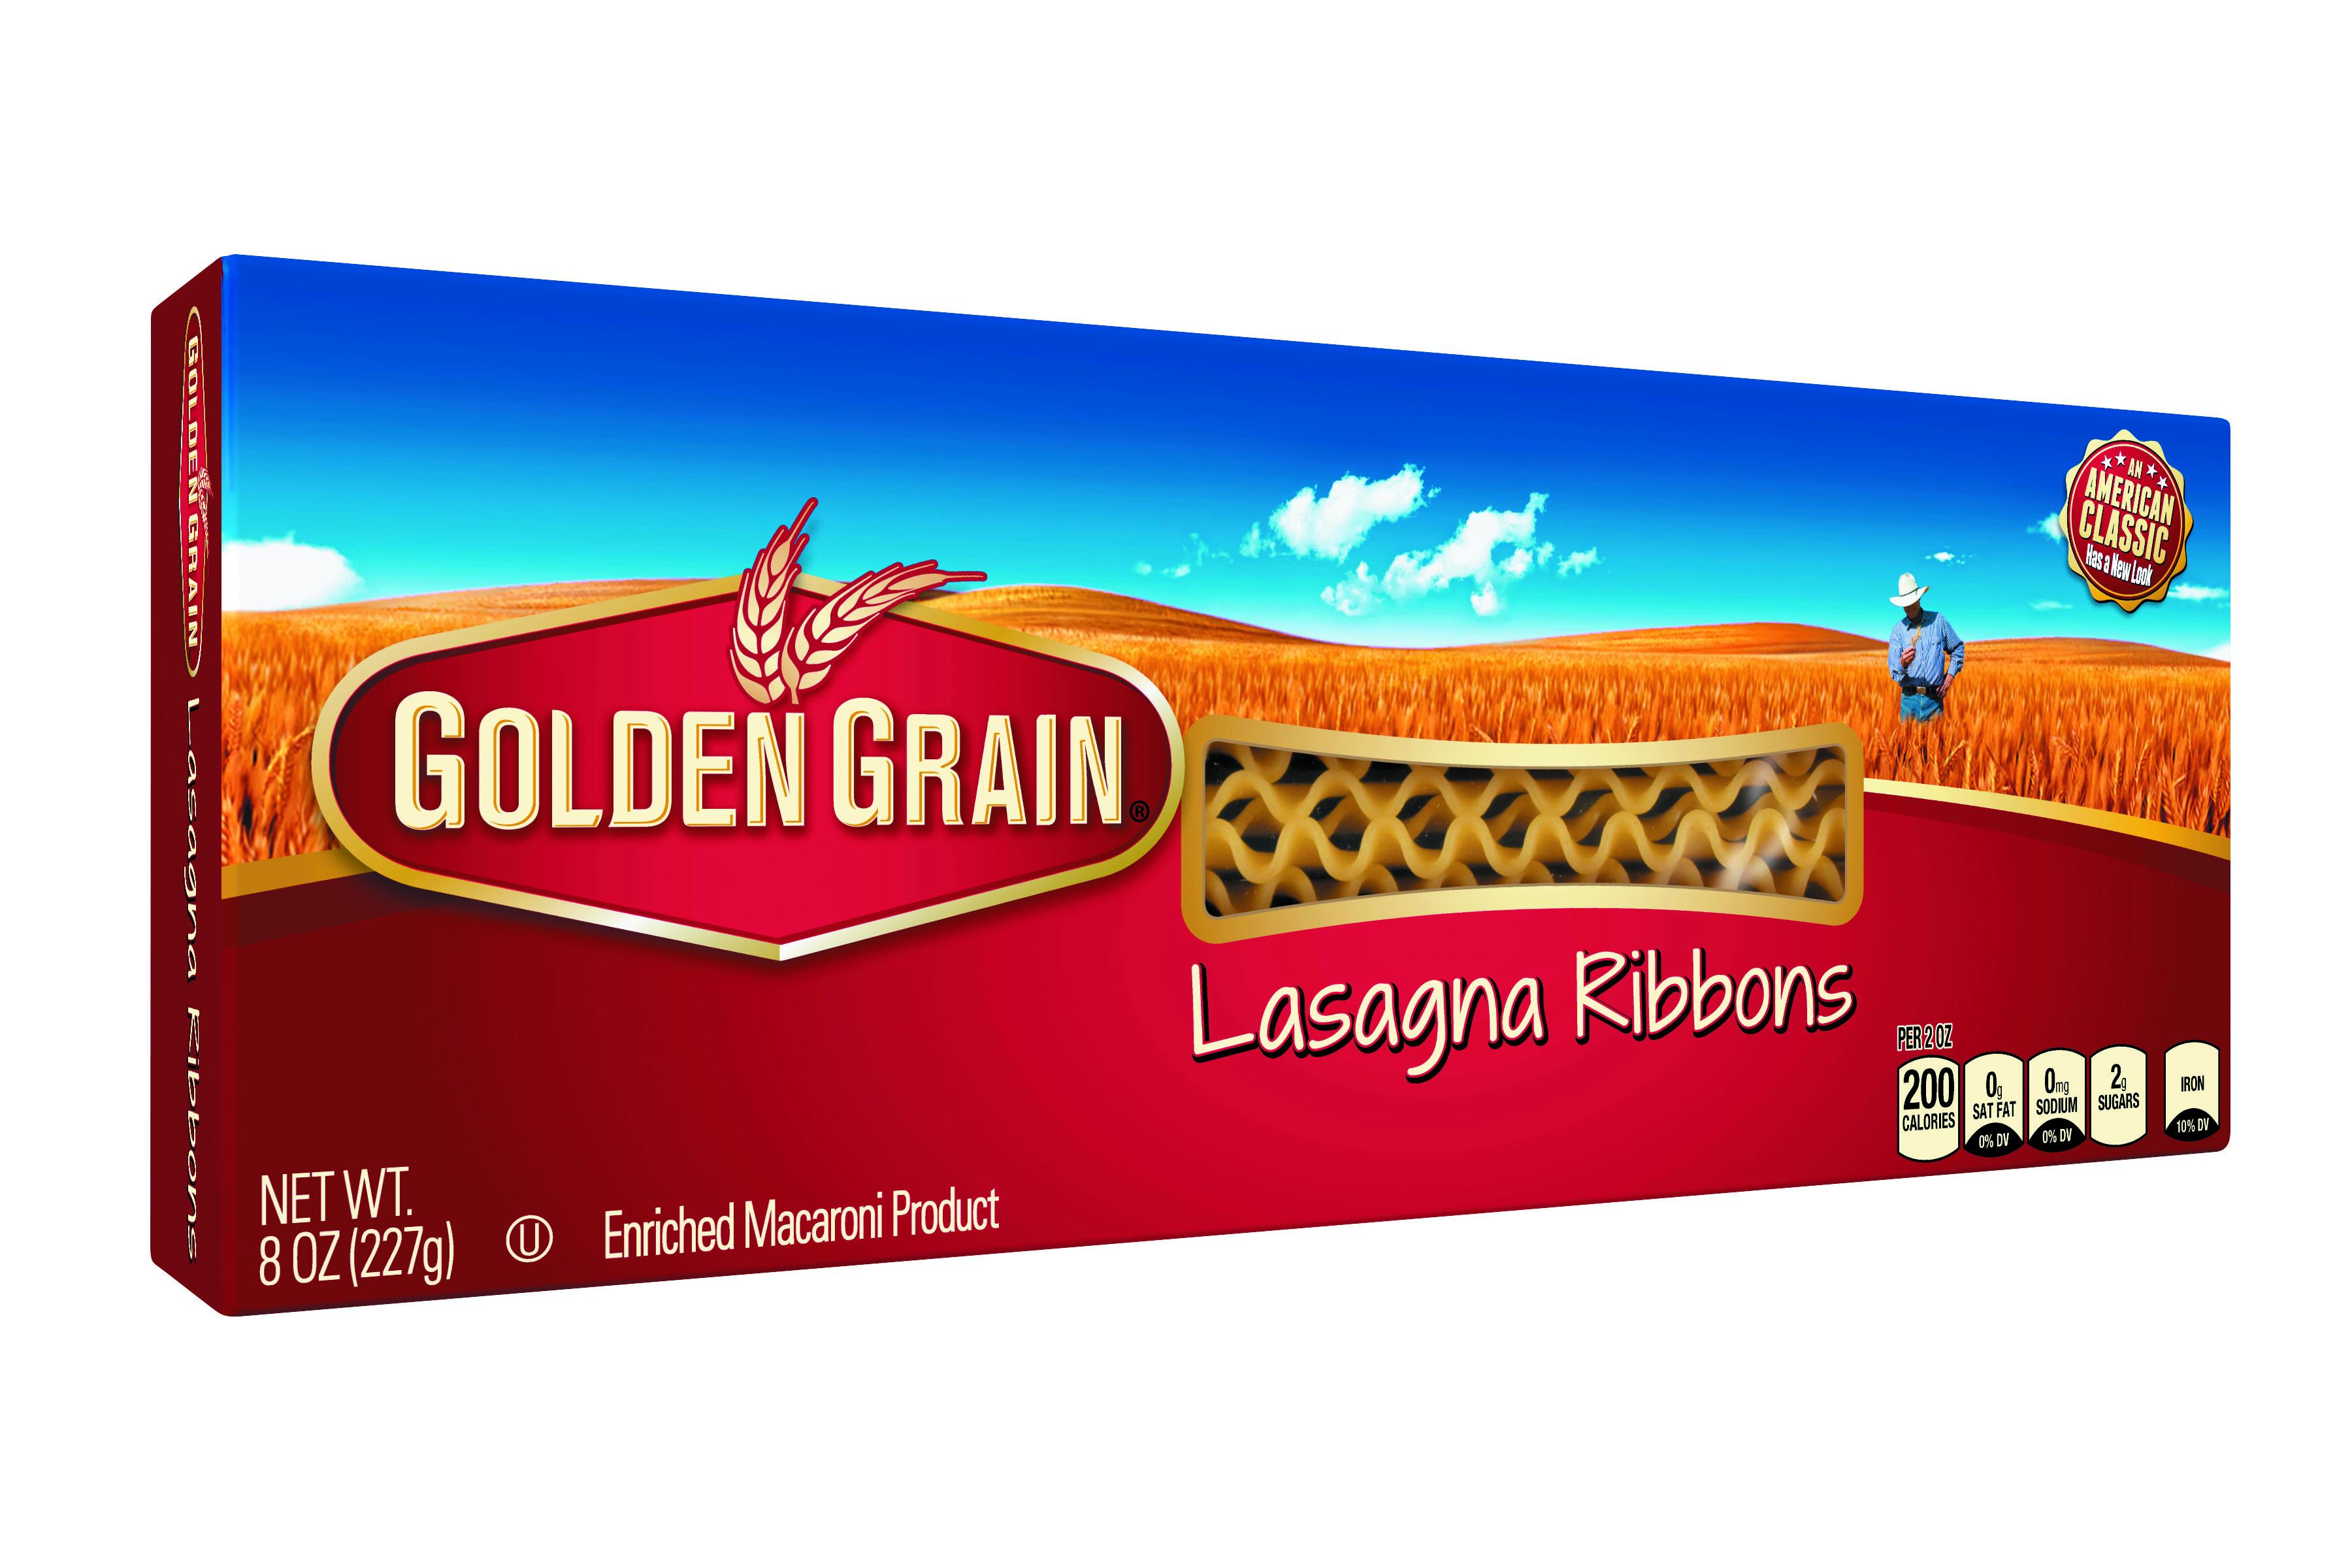 8oz-Lasagna-Ribbons 100% Semolina